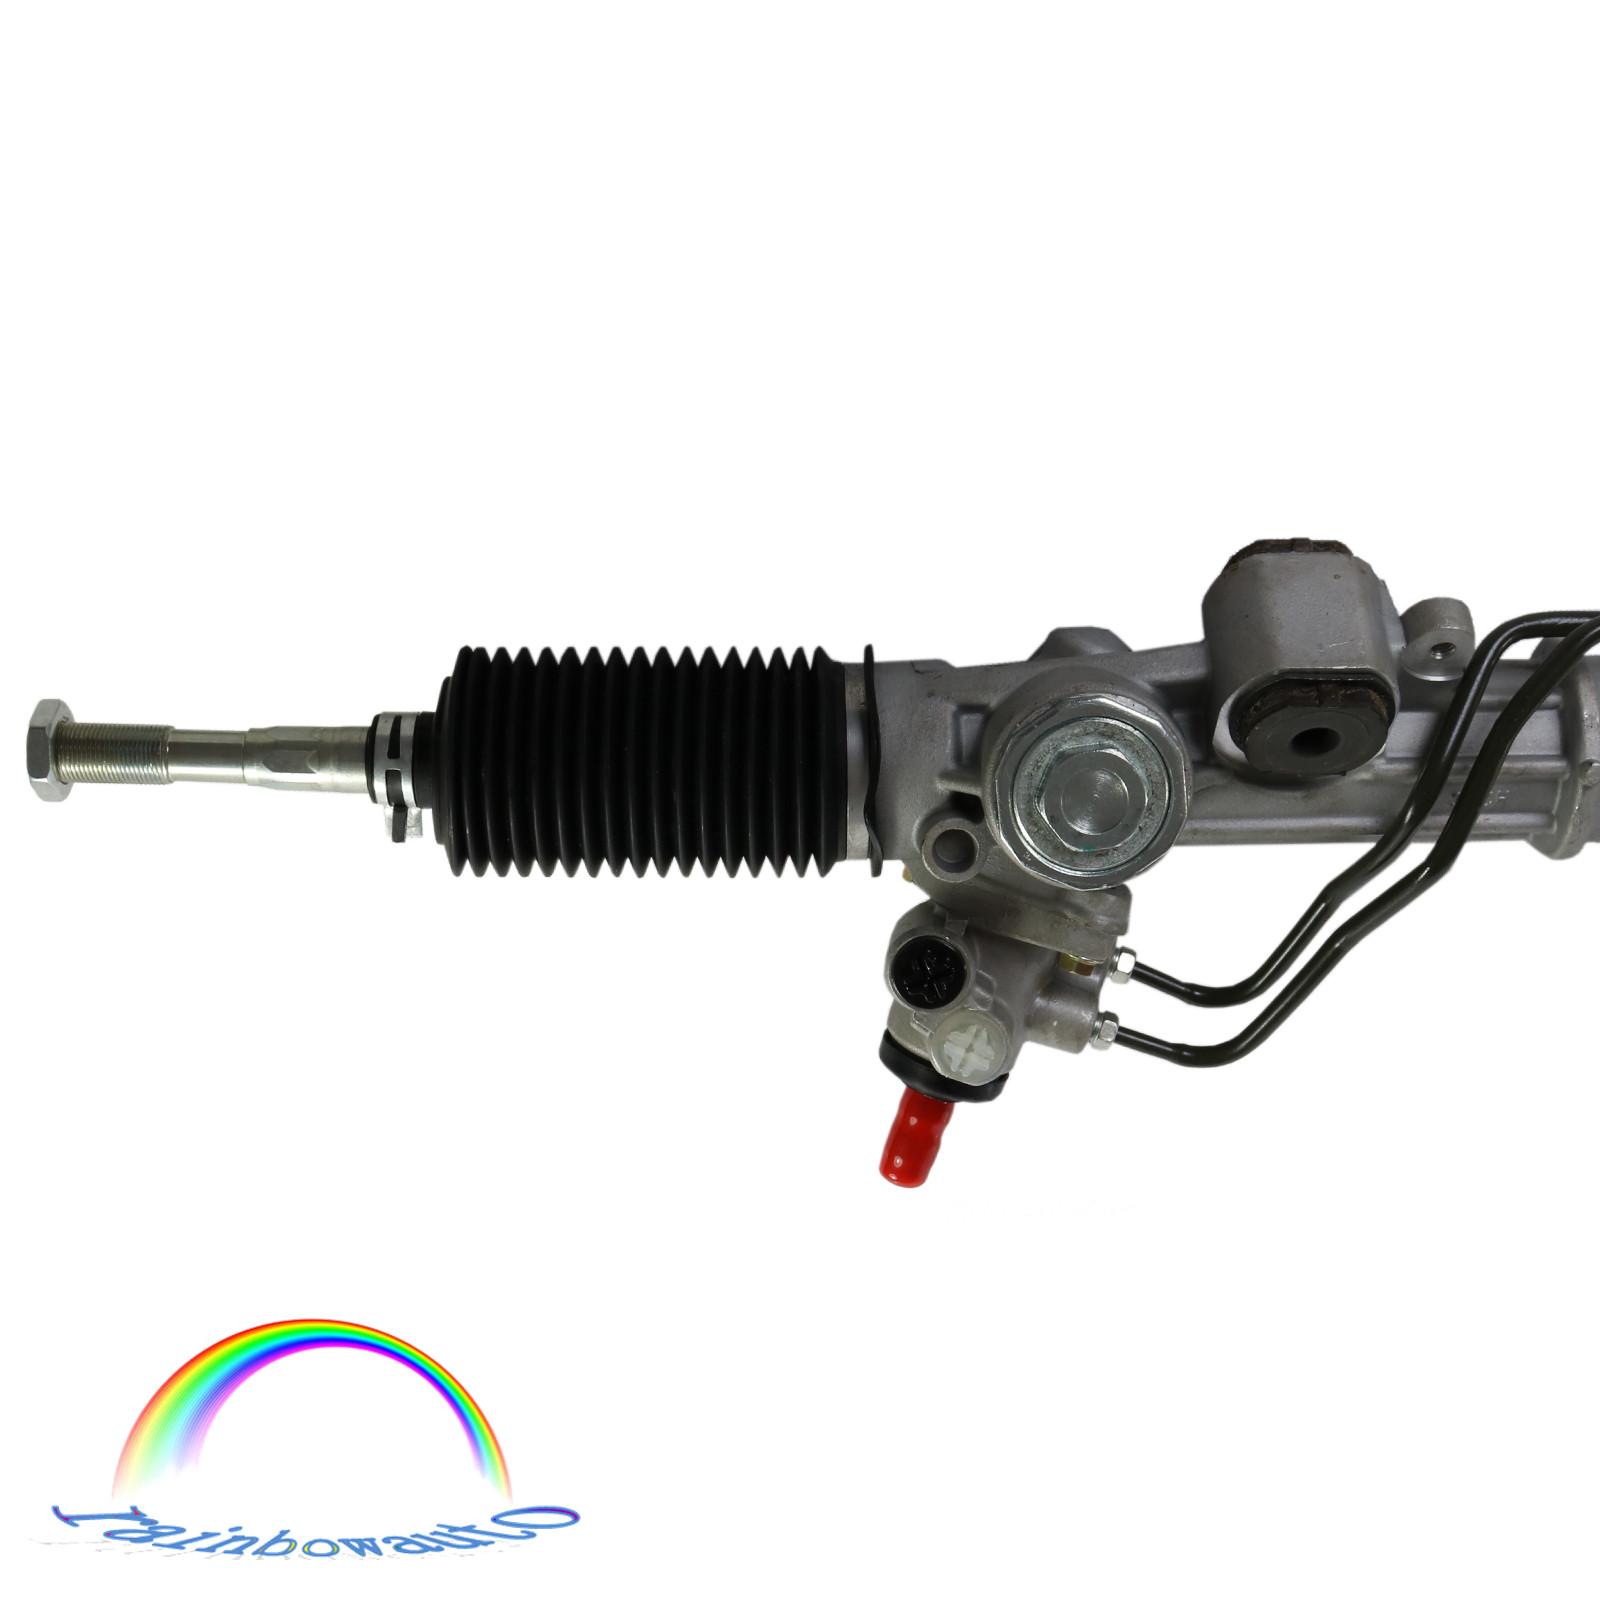 Power Steering cremalheira e pinhão para Lexus LX470 Toyota Land Cruiser UZJ100 03-07